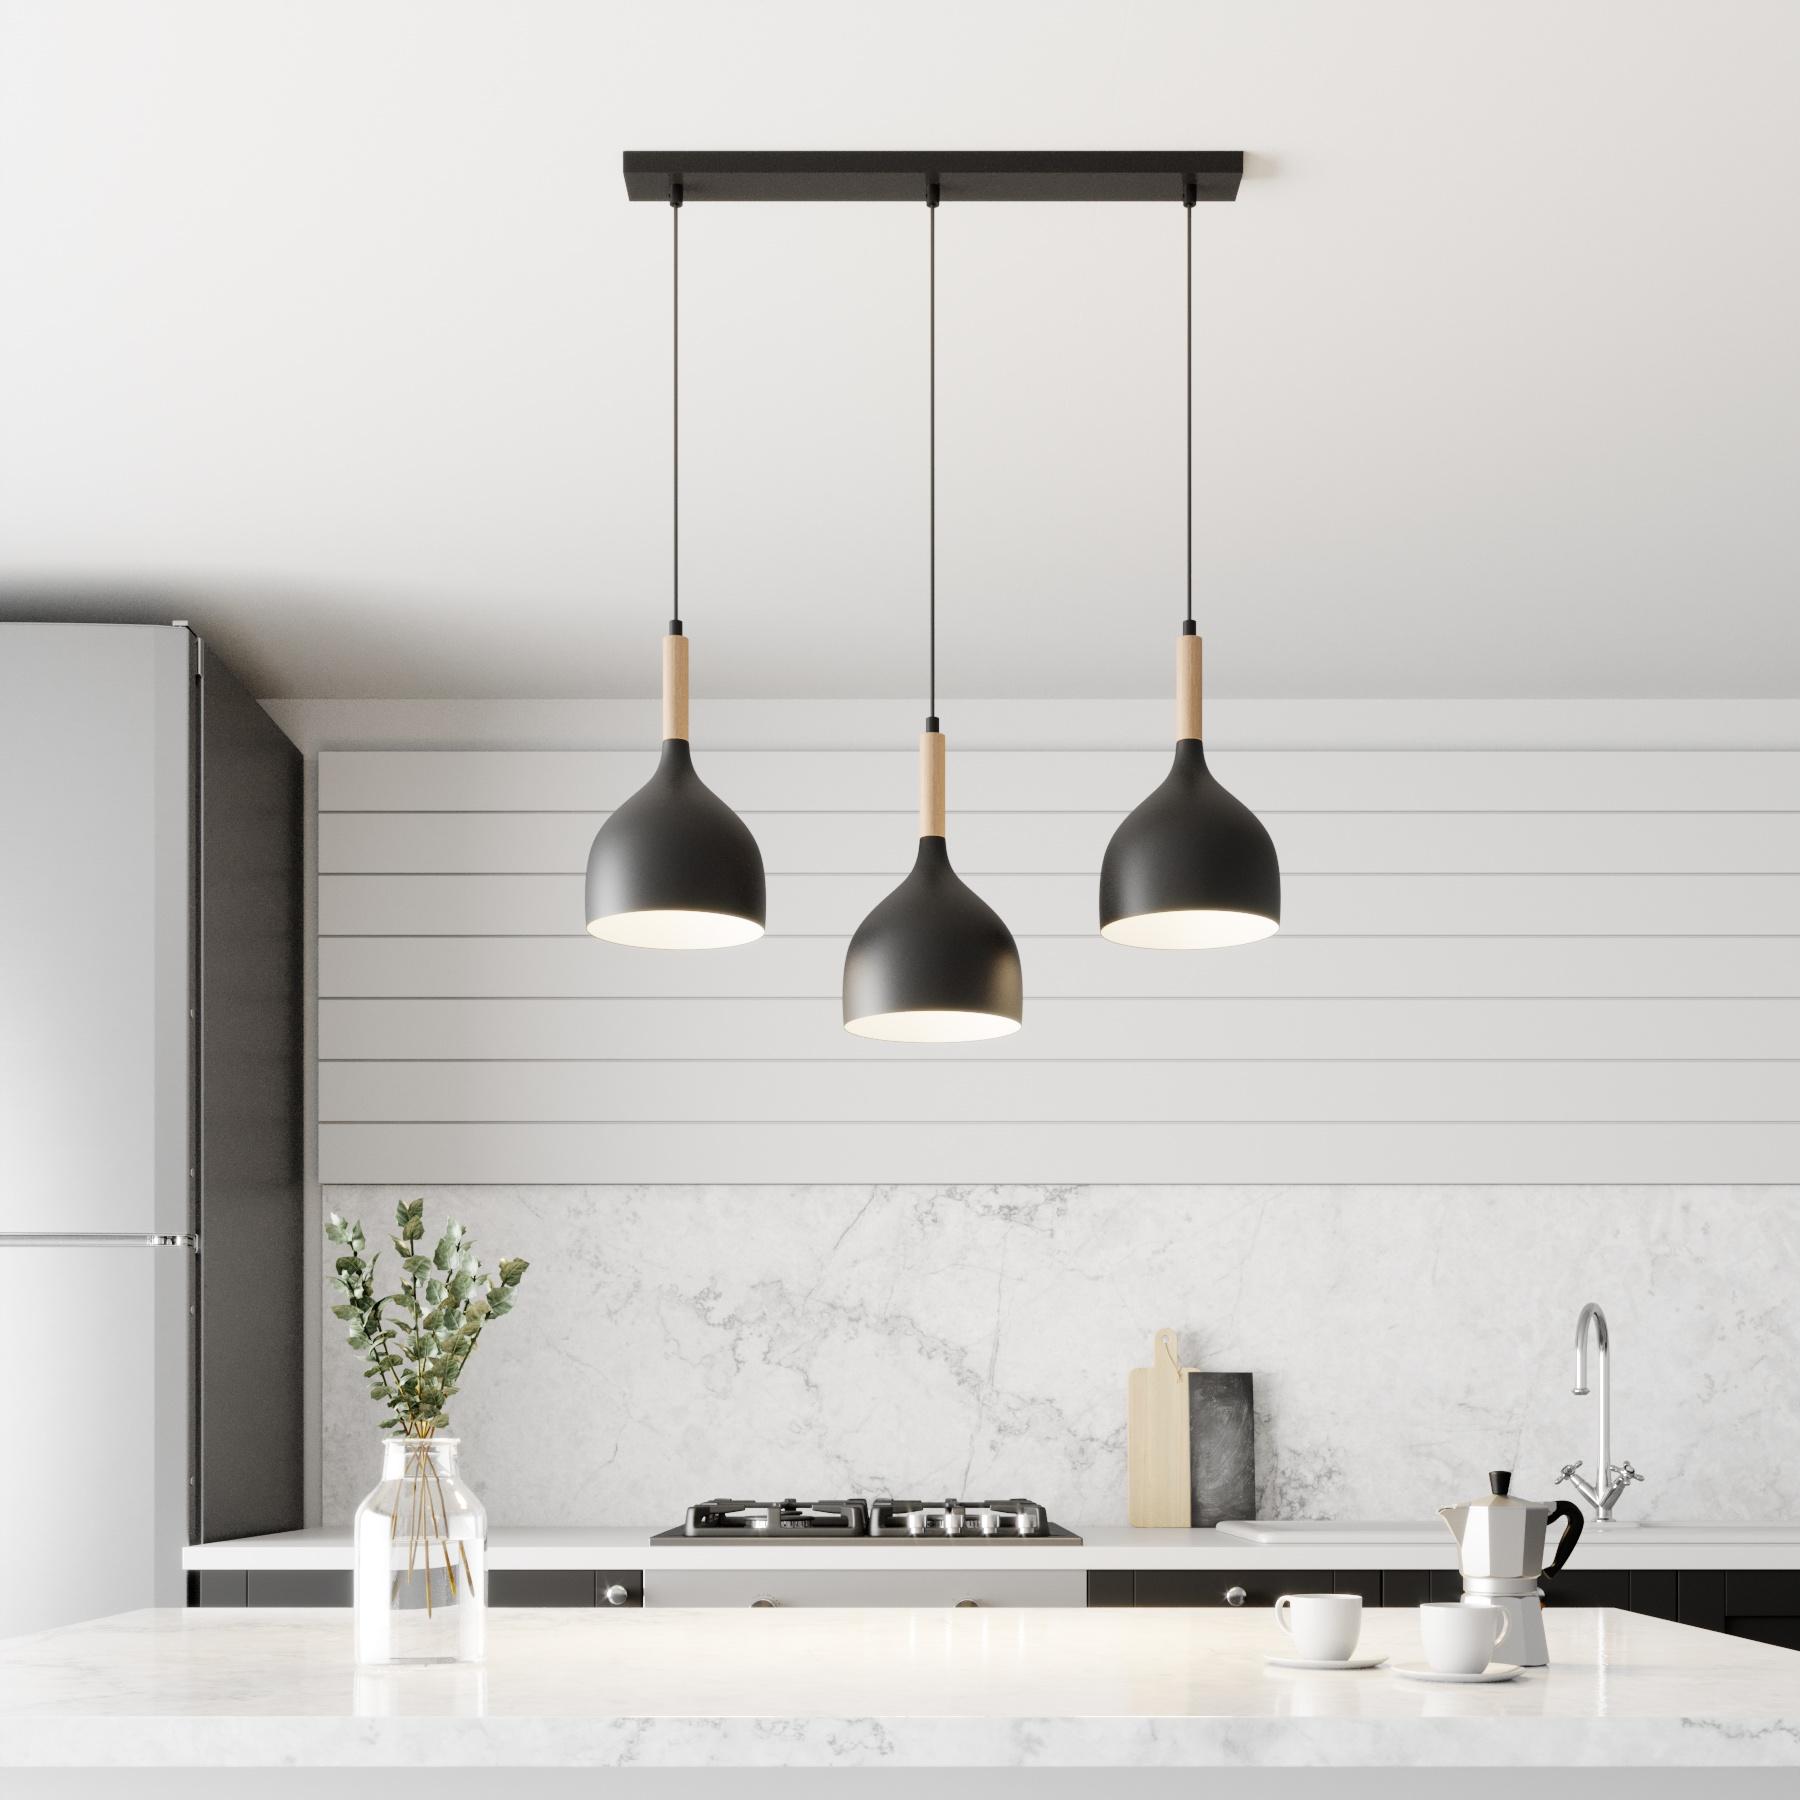 Hanglamp Noak 3-lamps lineair zwart/hout natuur